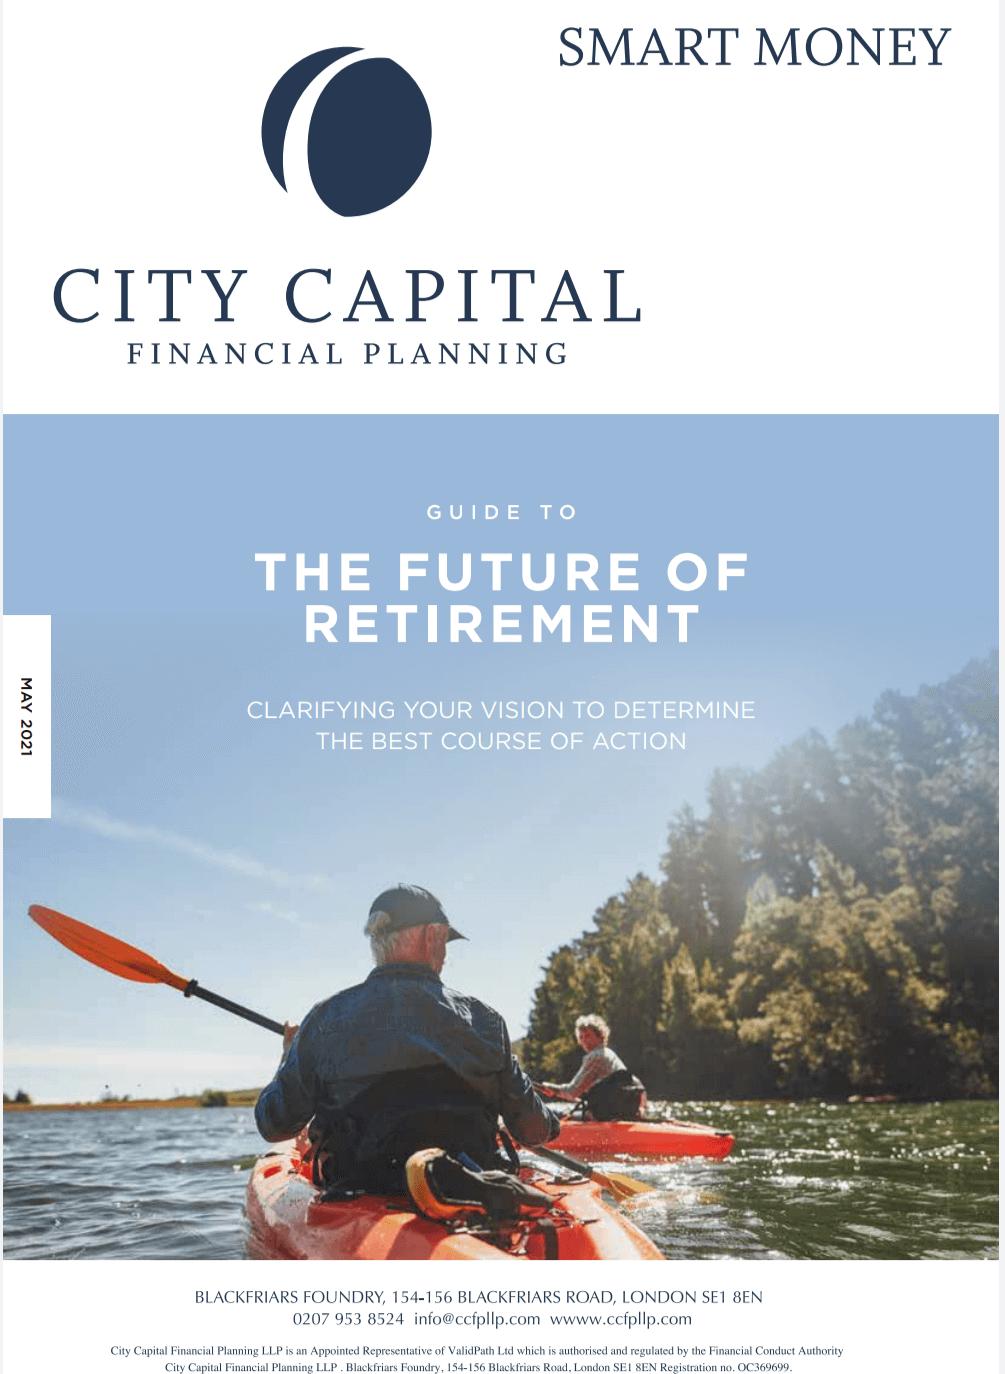 The Future of Retirement